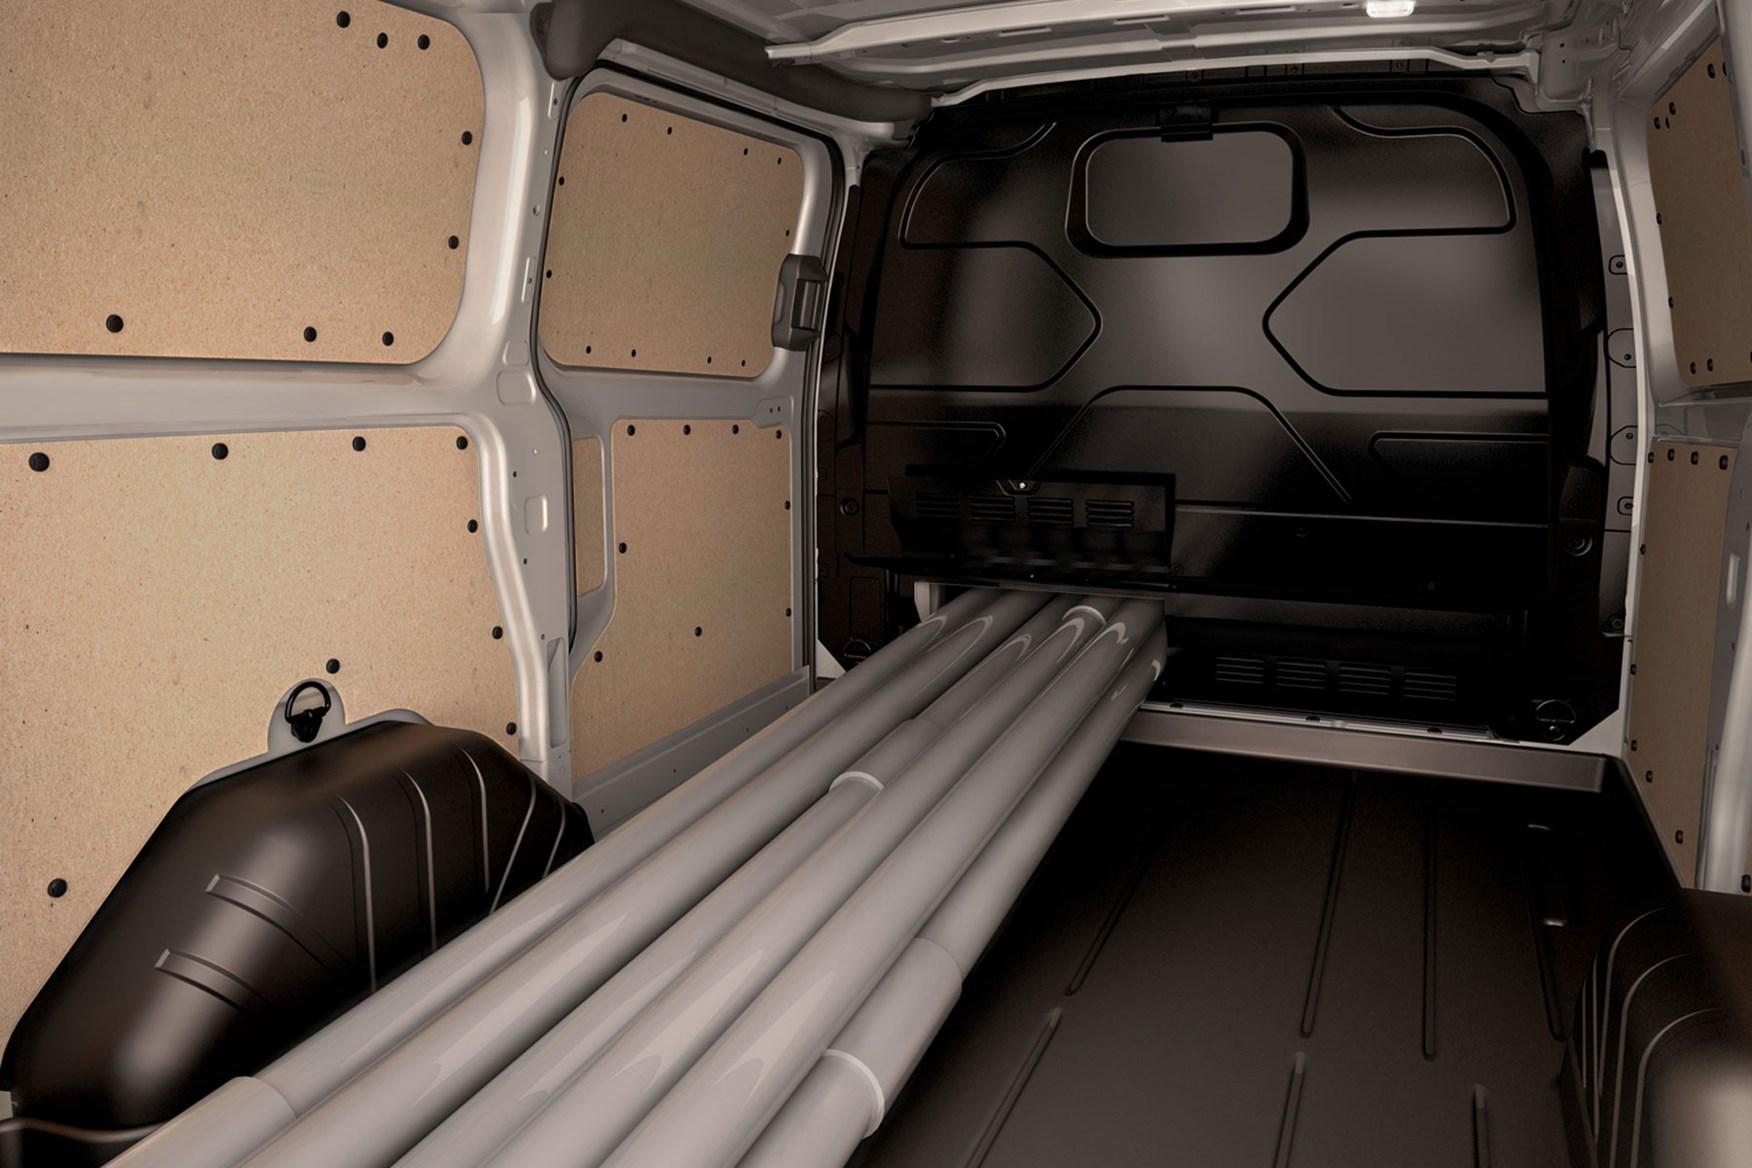 e9c2094a8a Ford Transit Custom dimensions - load through bulkhead